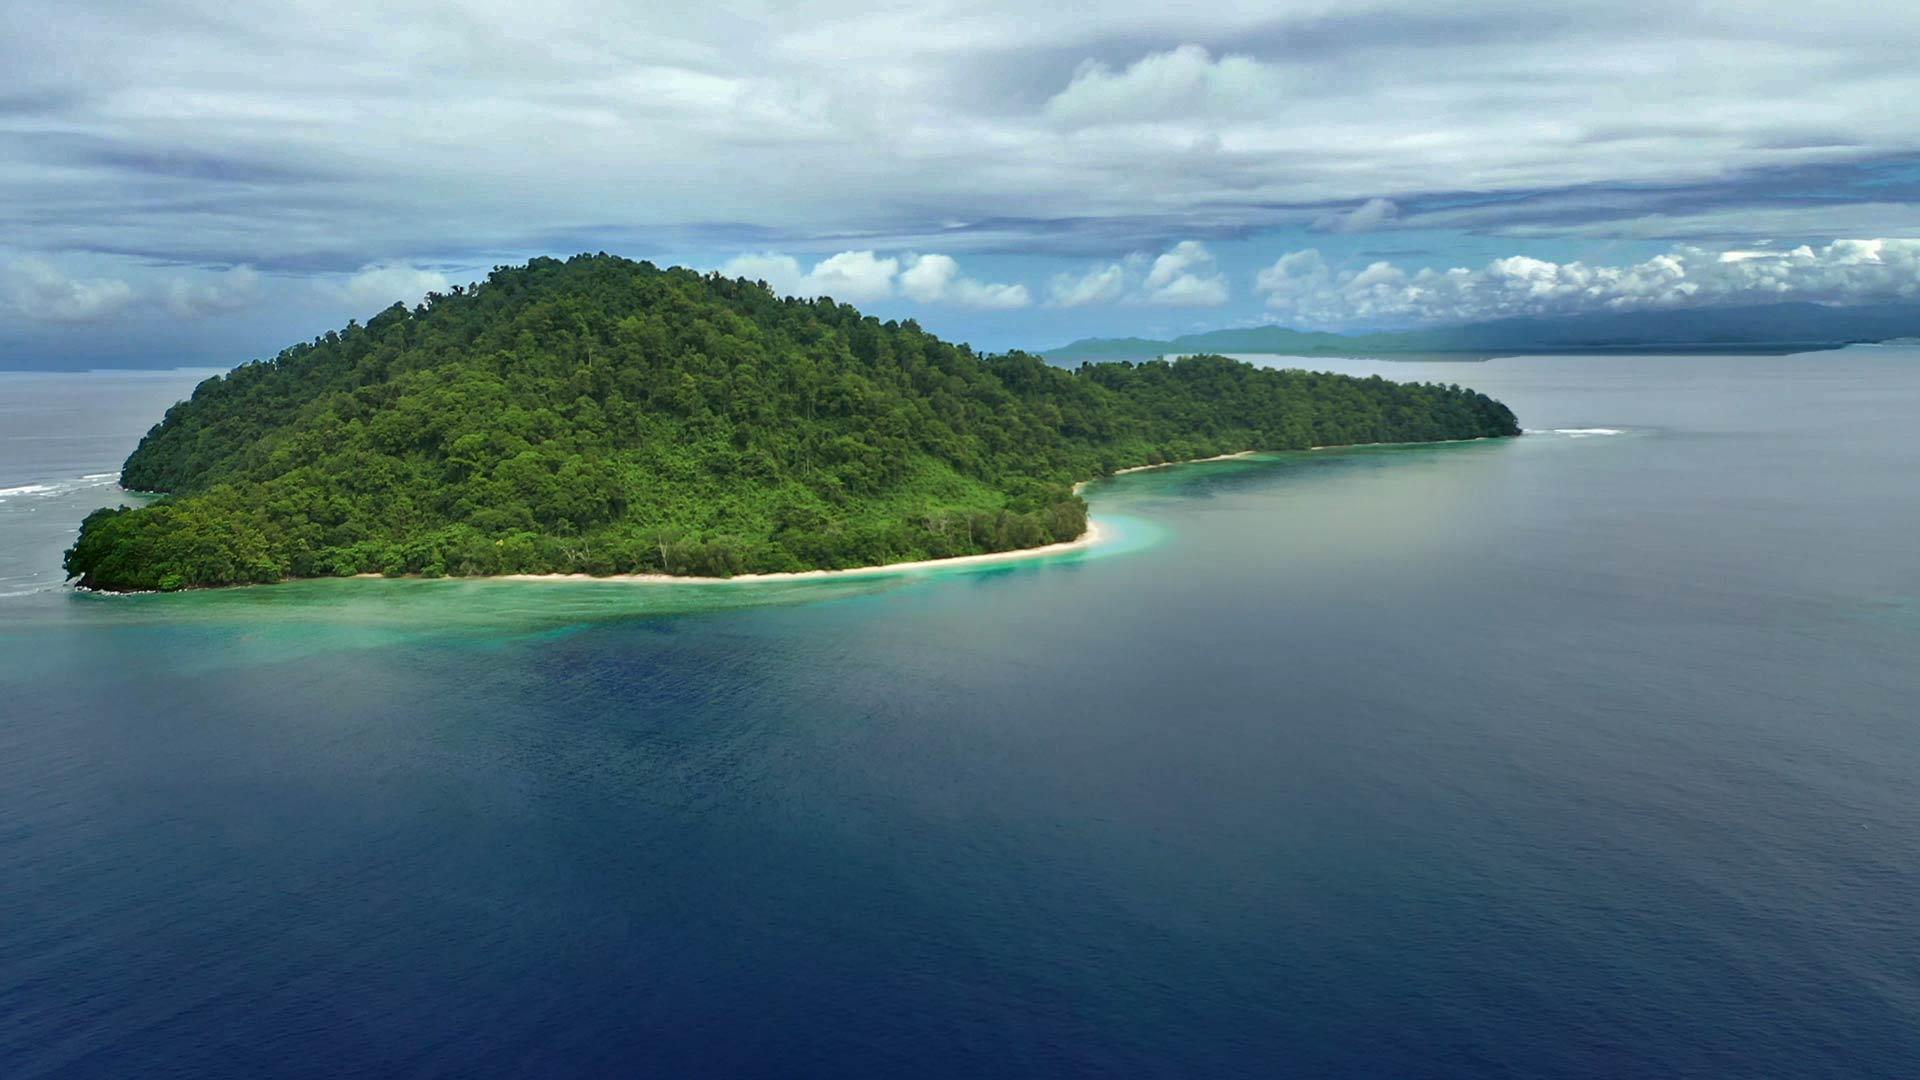 View of Siroktabe Desert Island from the sky